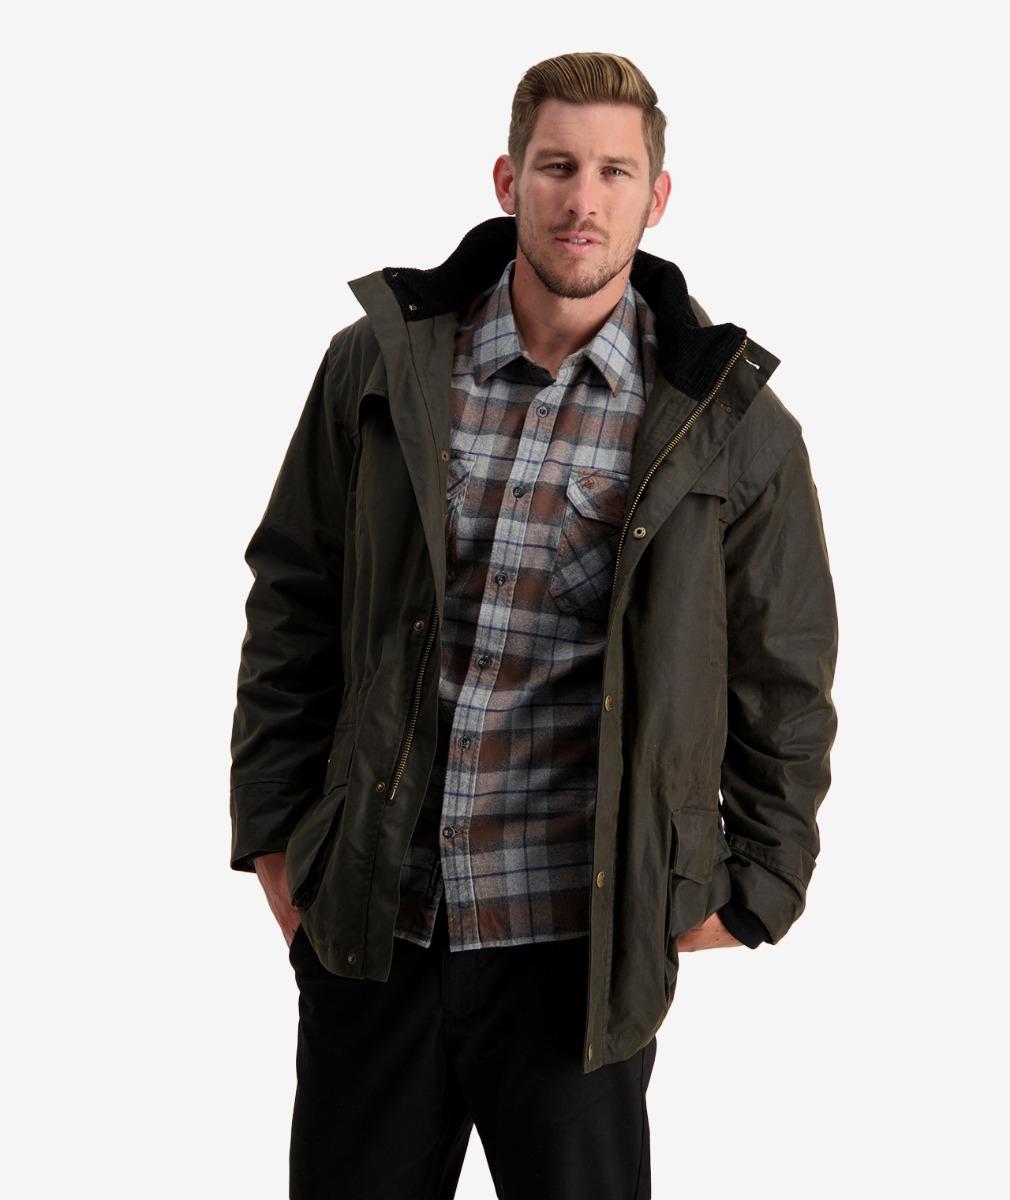 Evans Flat Oilskin Jacket in Dark Olive